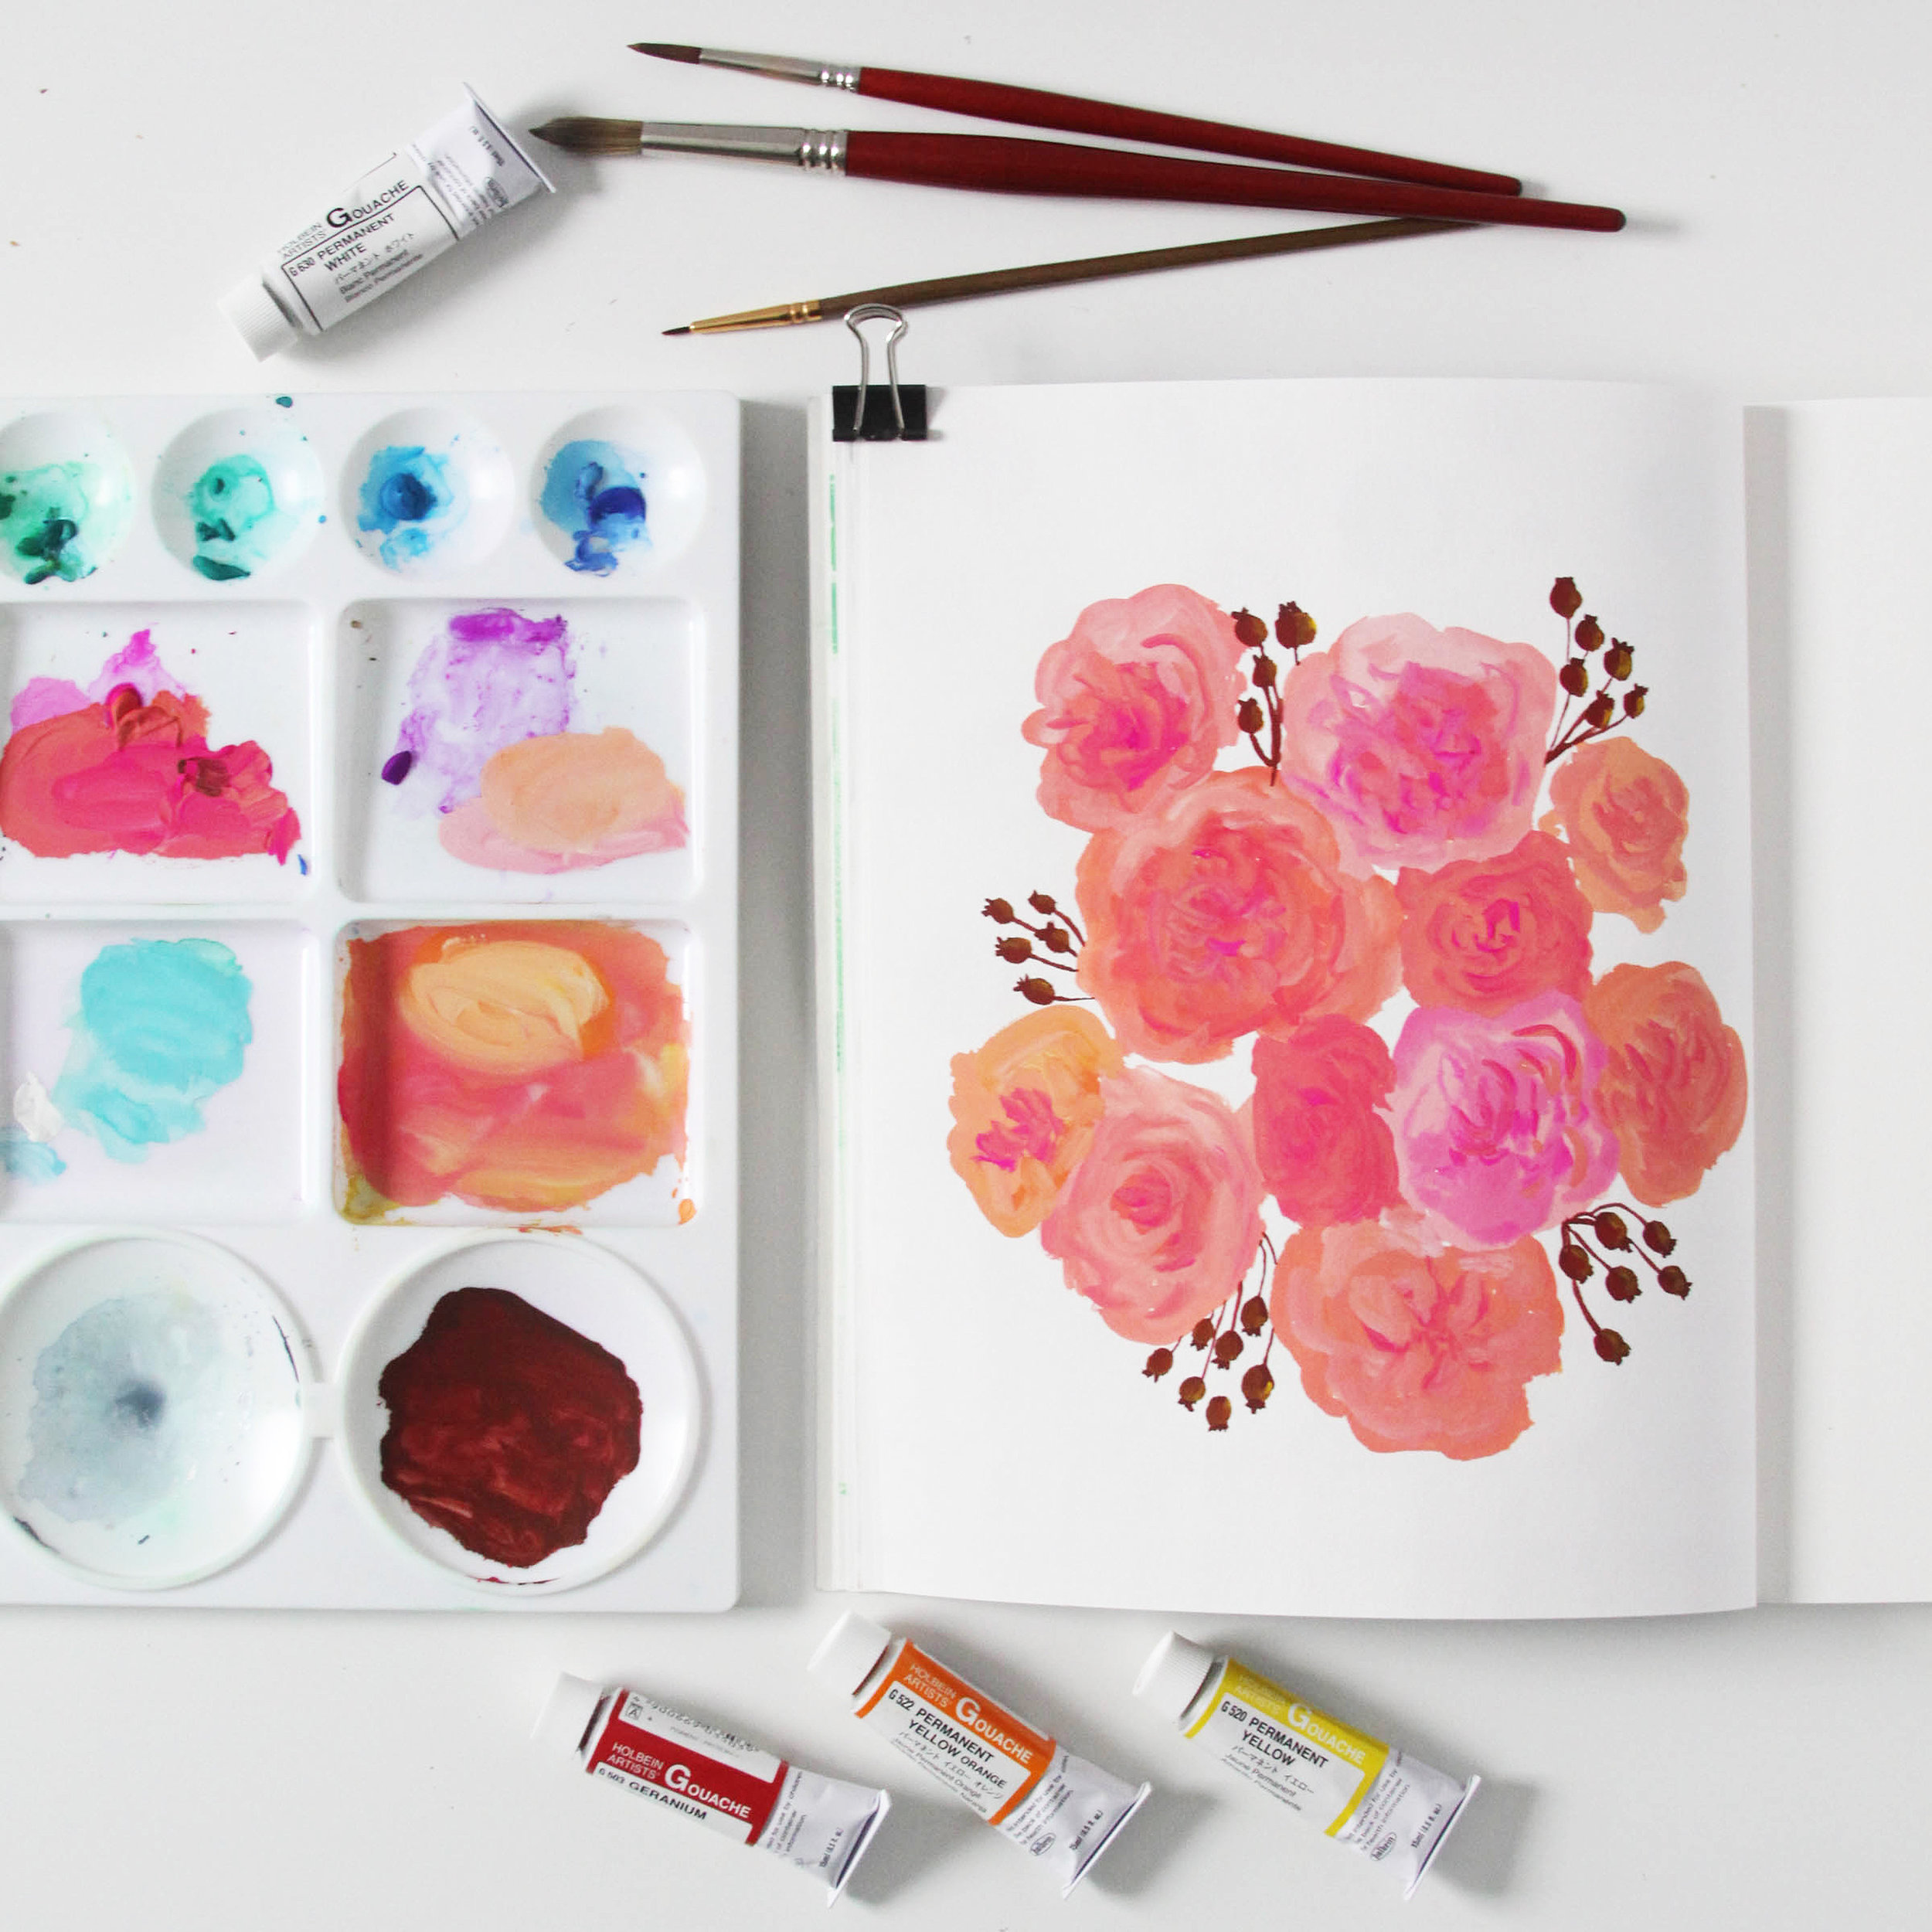 Roses in Gouache in Anne Butera's Sketchbook